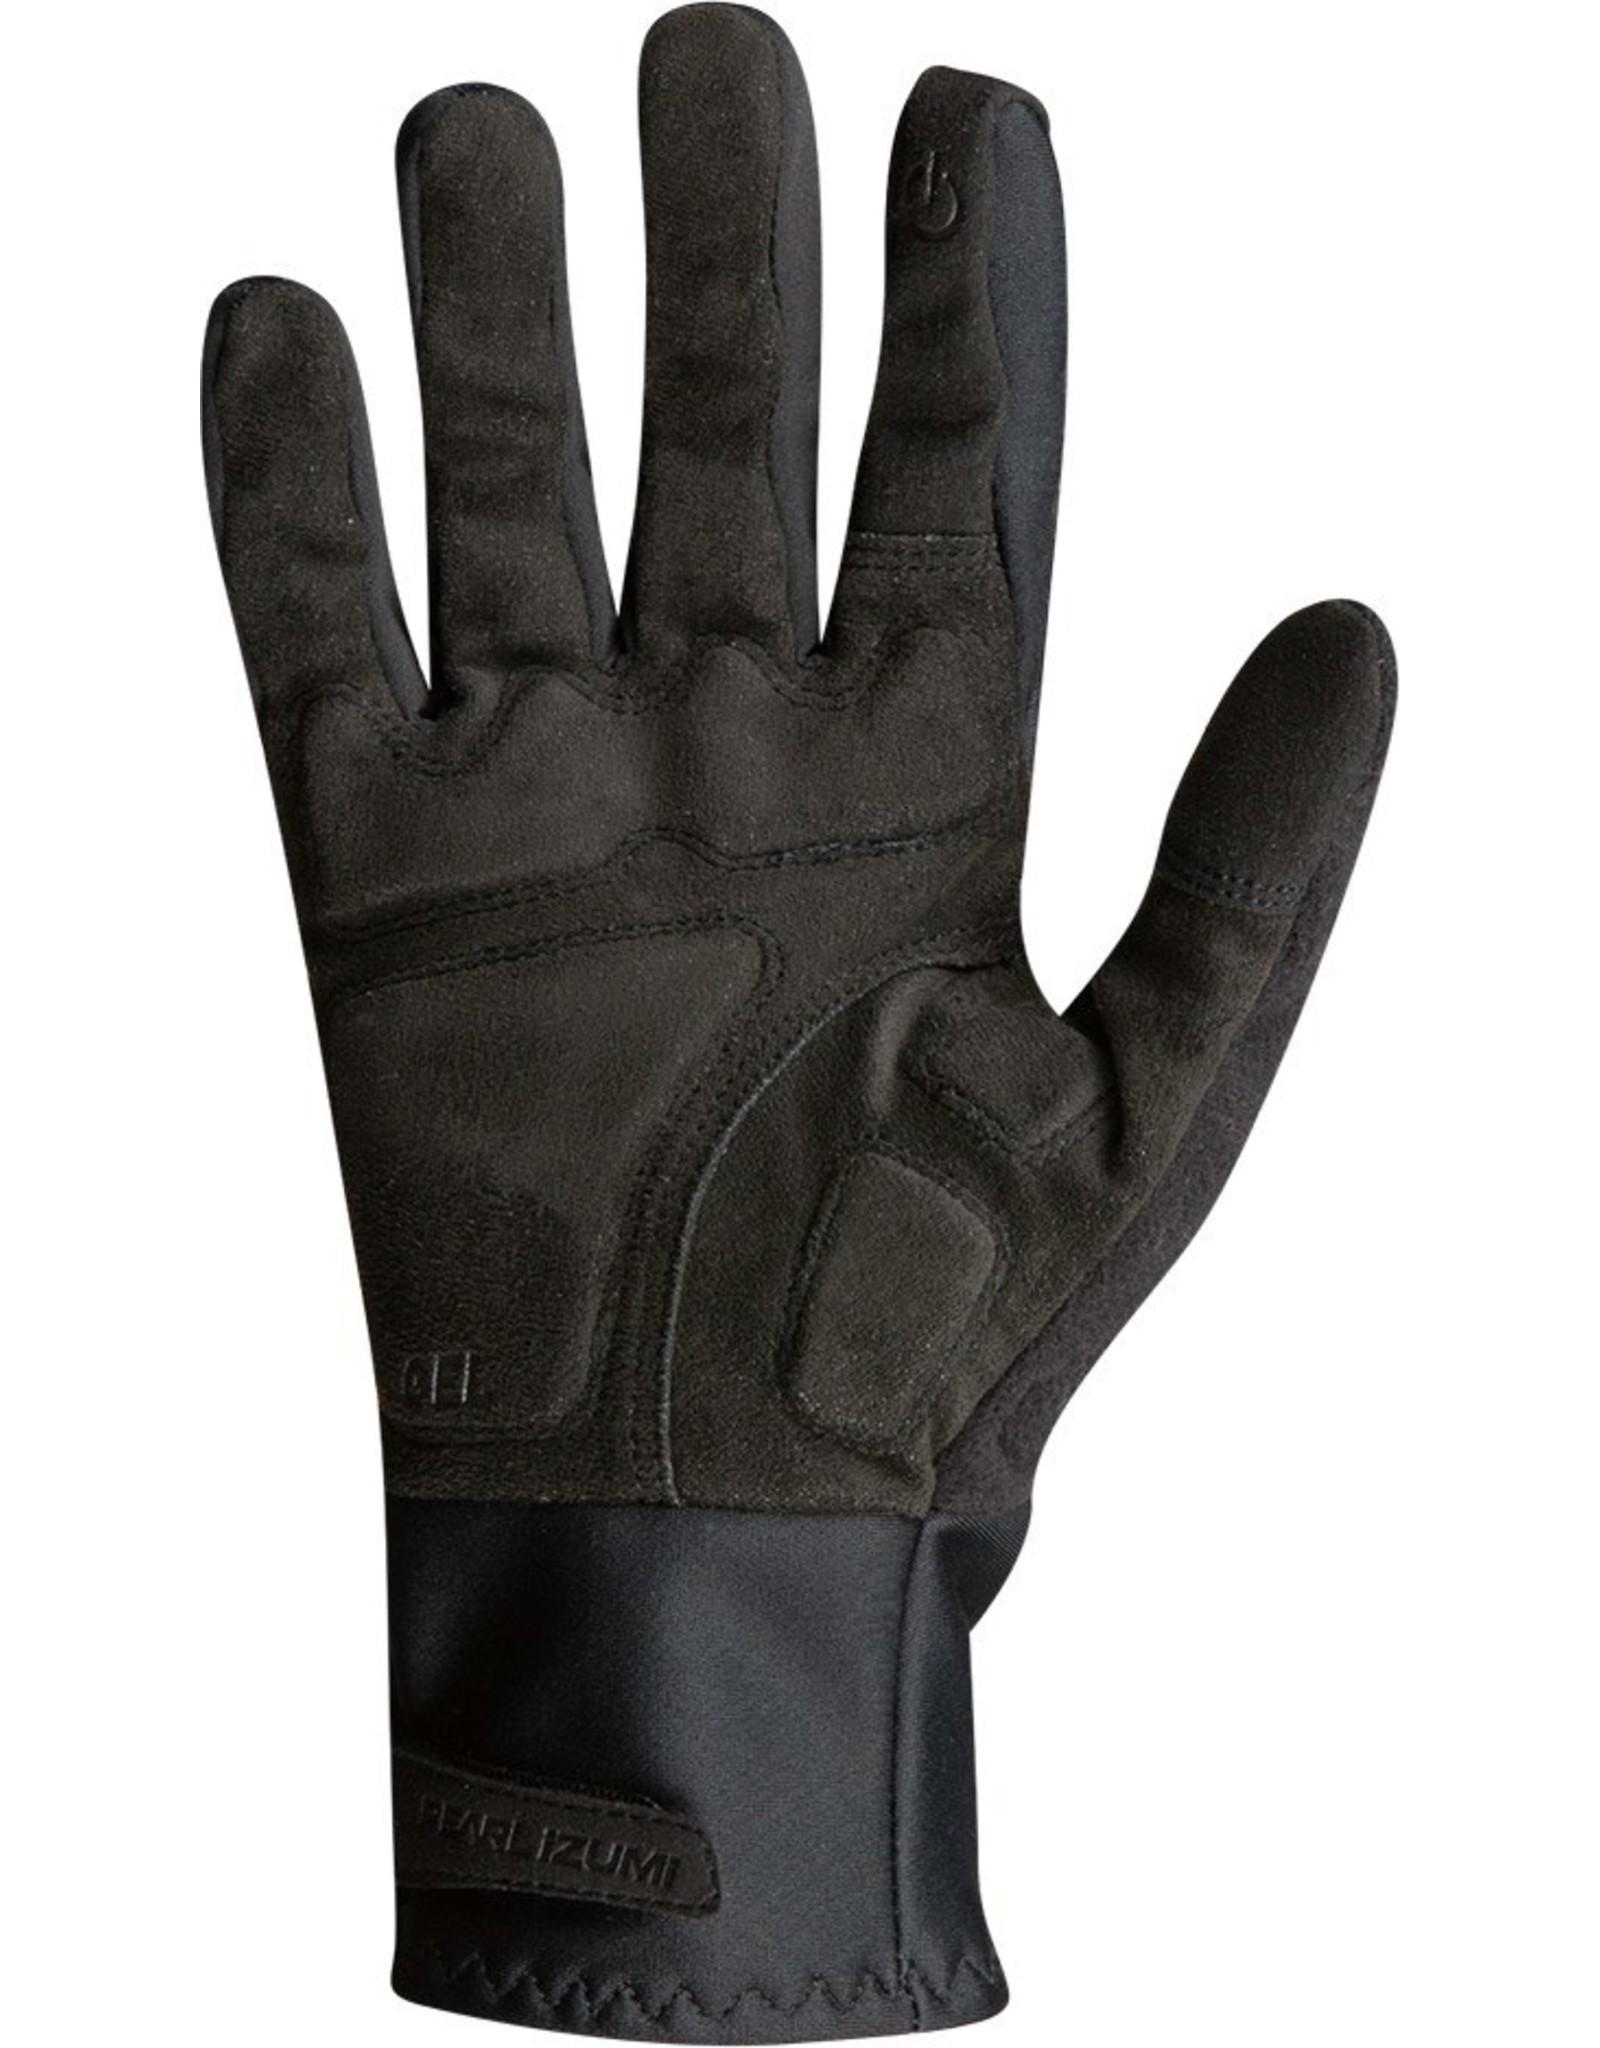 Pearl Izumi Cyclone Gel Glove Mens Black